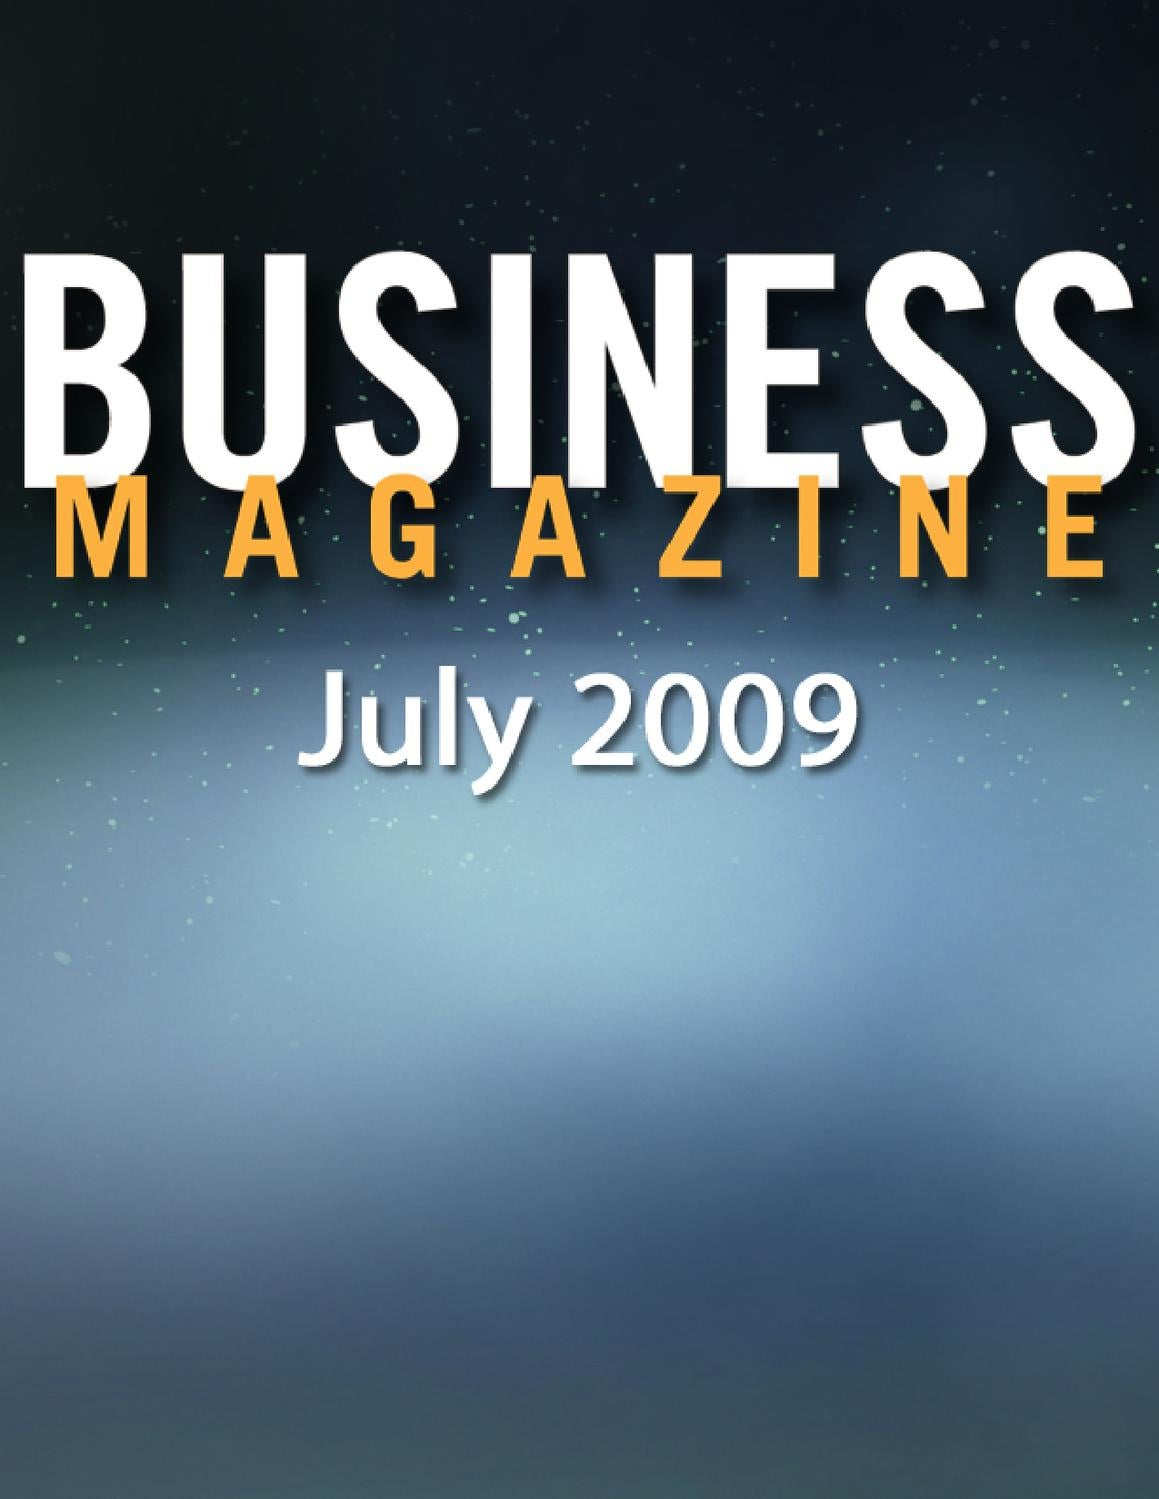 July 2009 Business Magazine by MBA Business Magazine - issuu